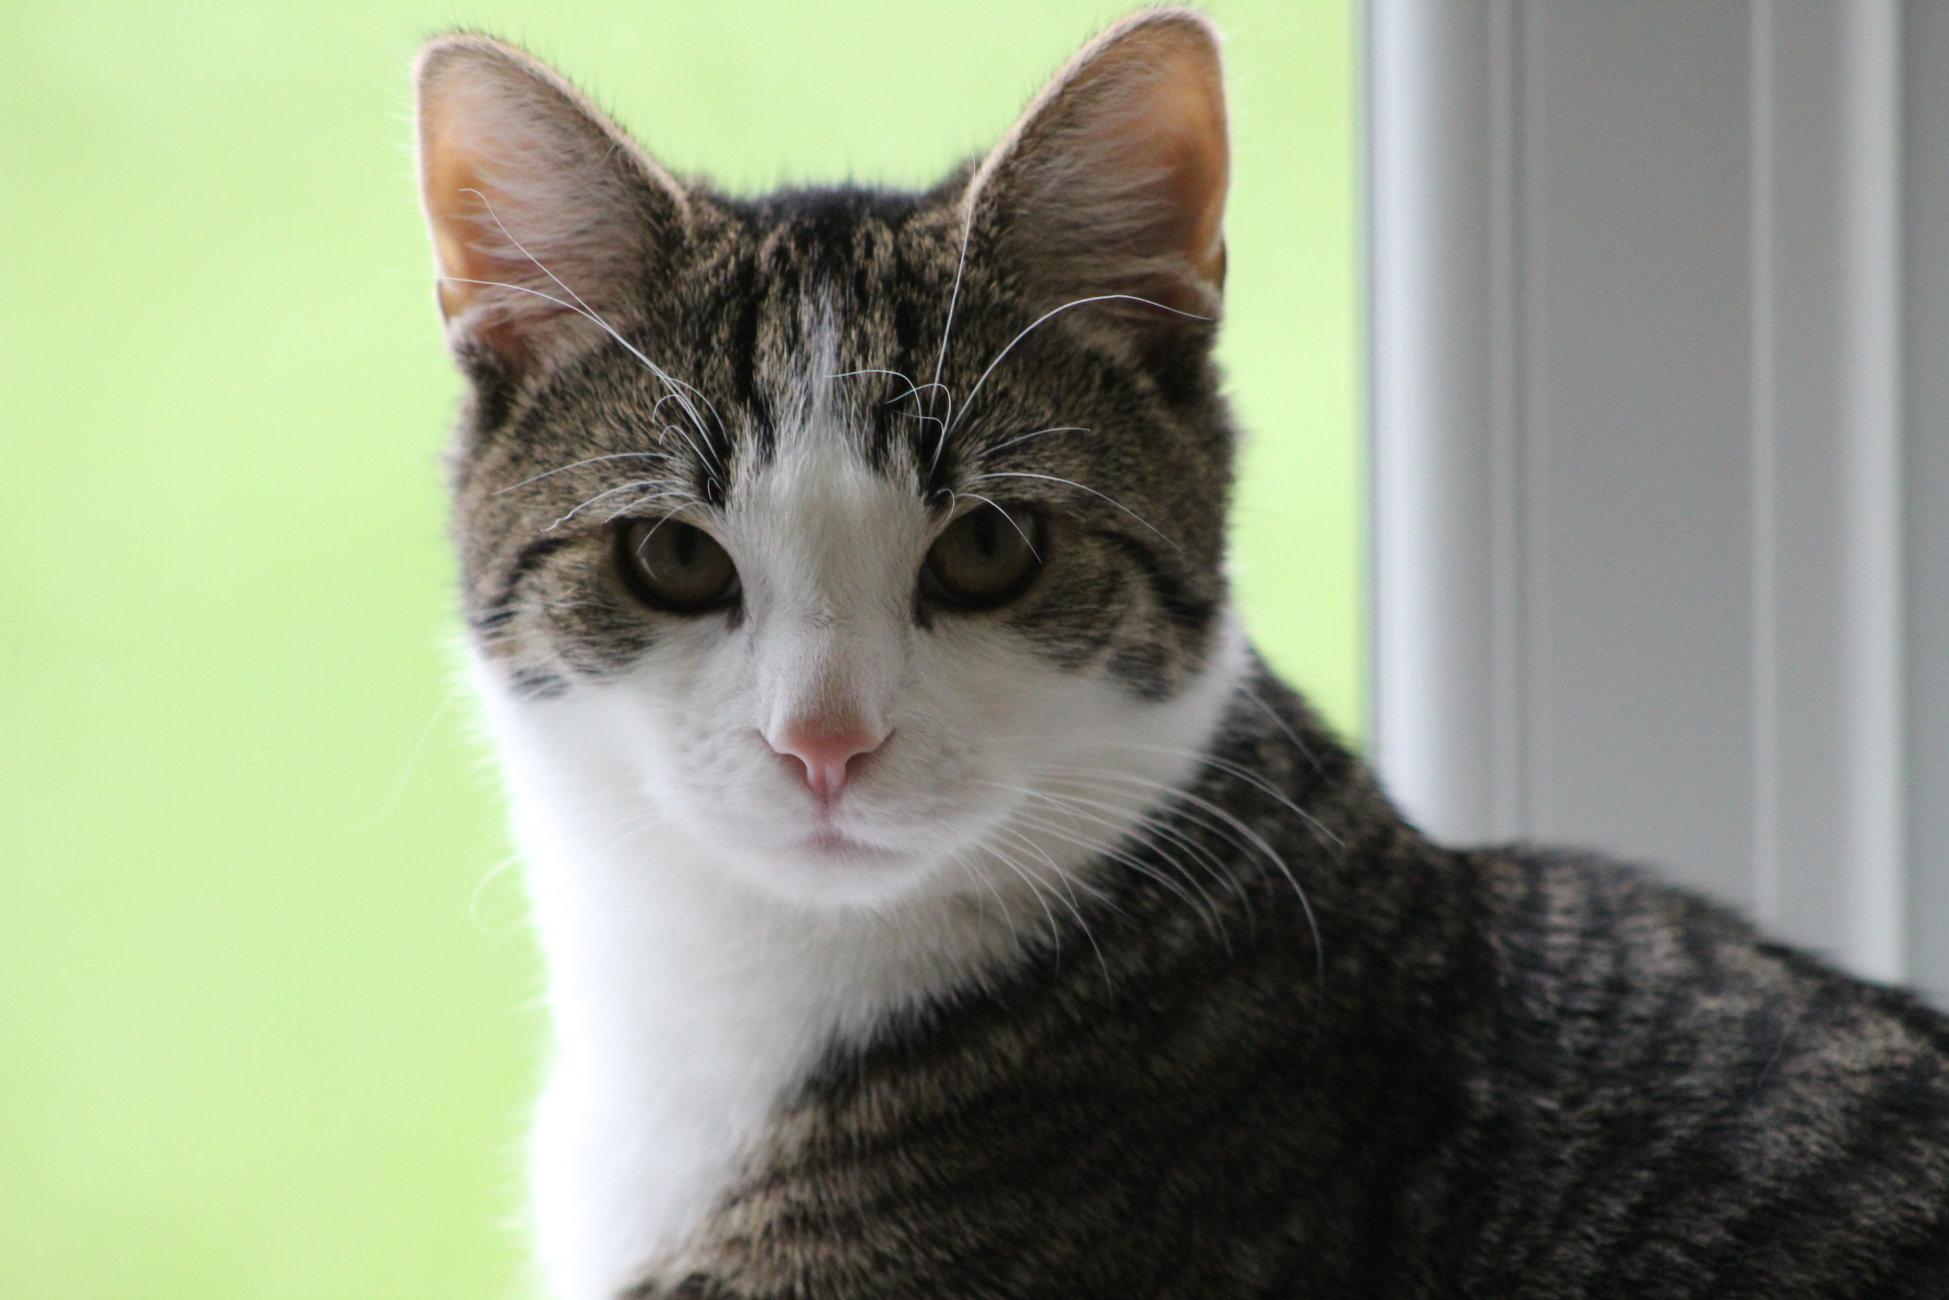 Amadeus practicing his hard stare!